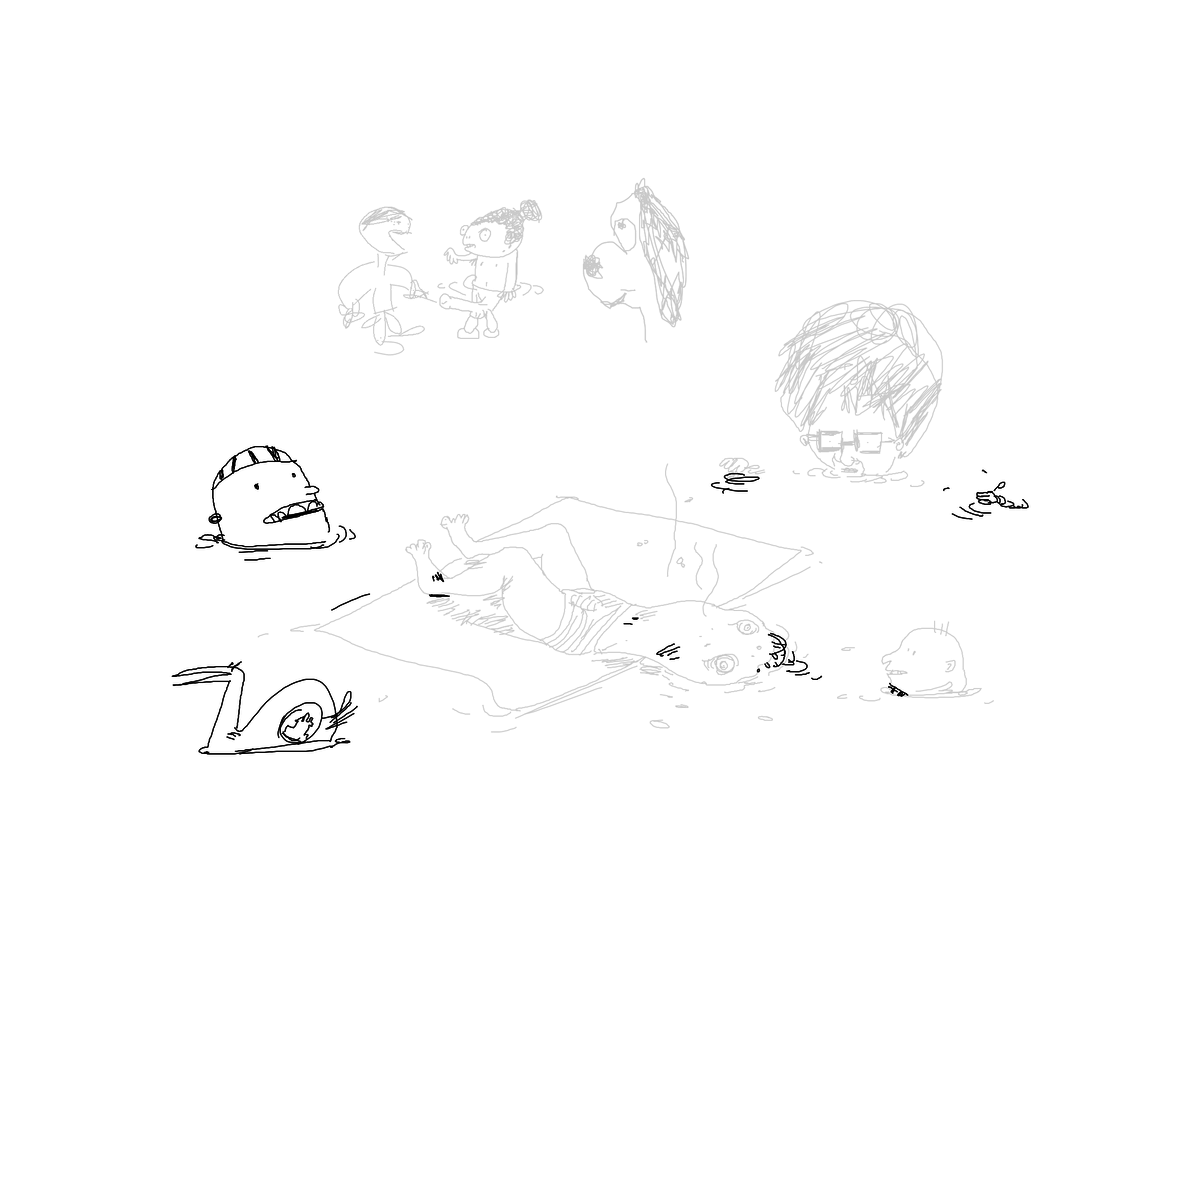 BAAAM drawing#8599 lat:53.5591125488281250lng: 10.0069046020507810